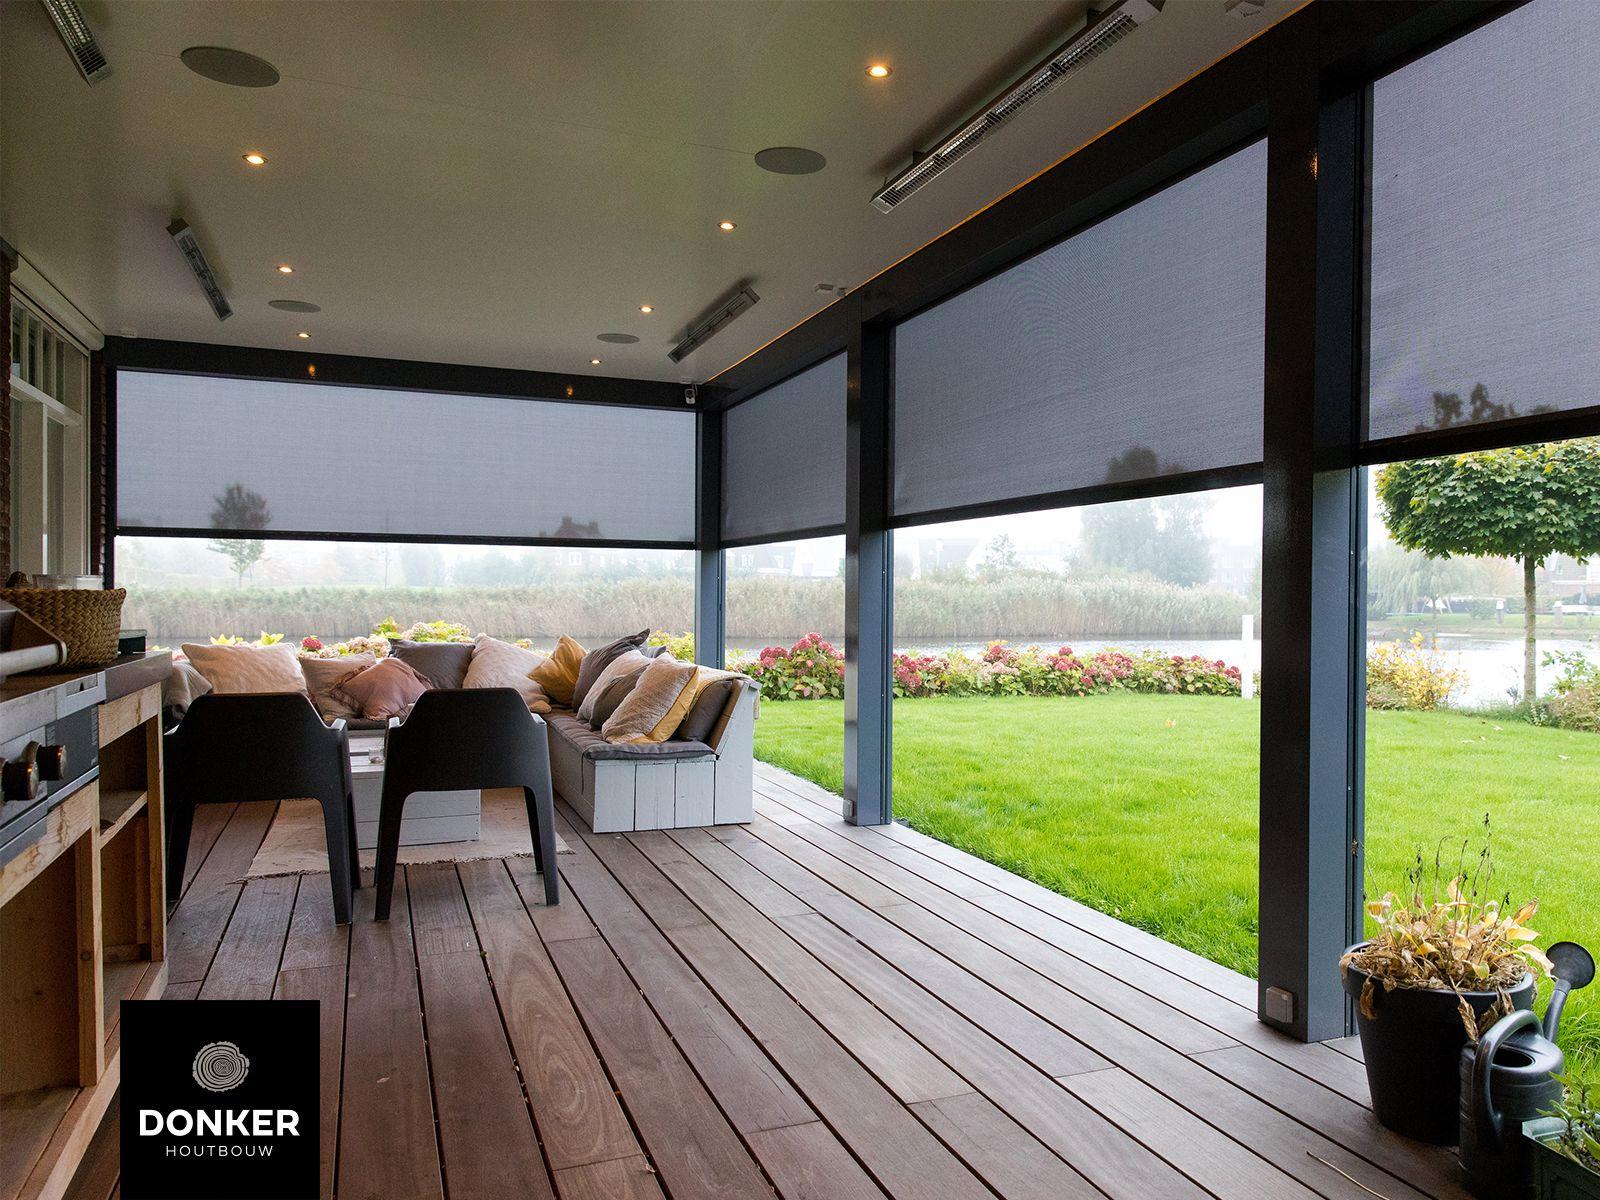 Donker Houtbouw Klassieke veranda Vlondervloer Veranda